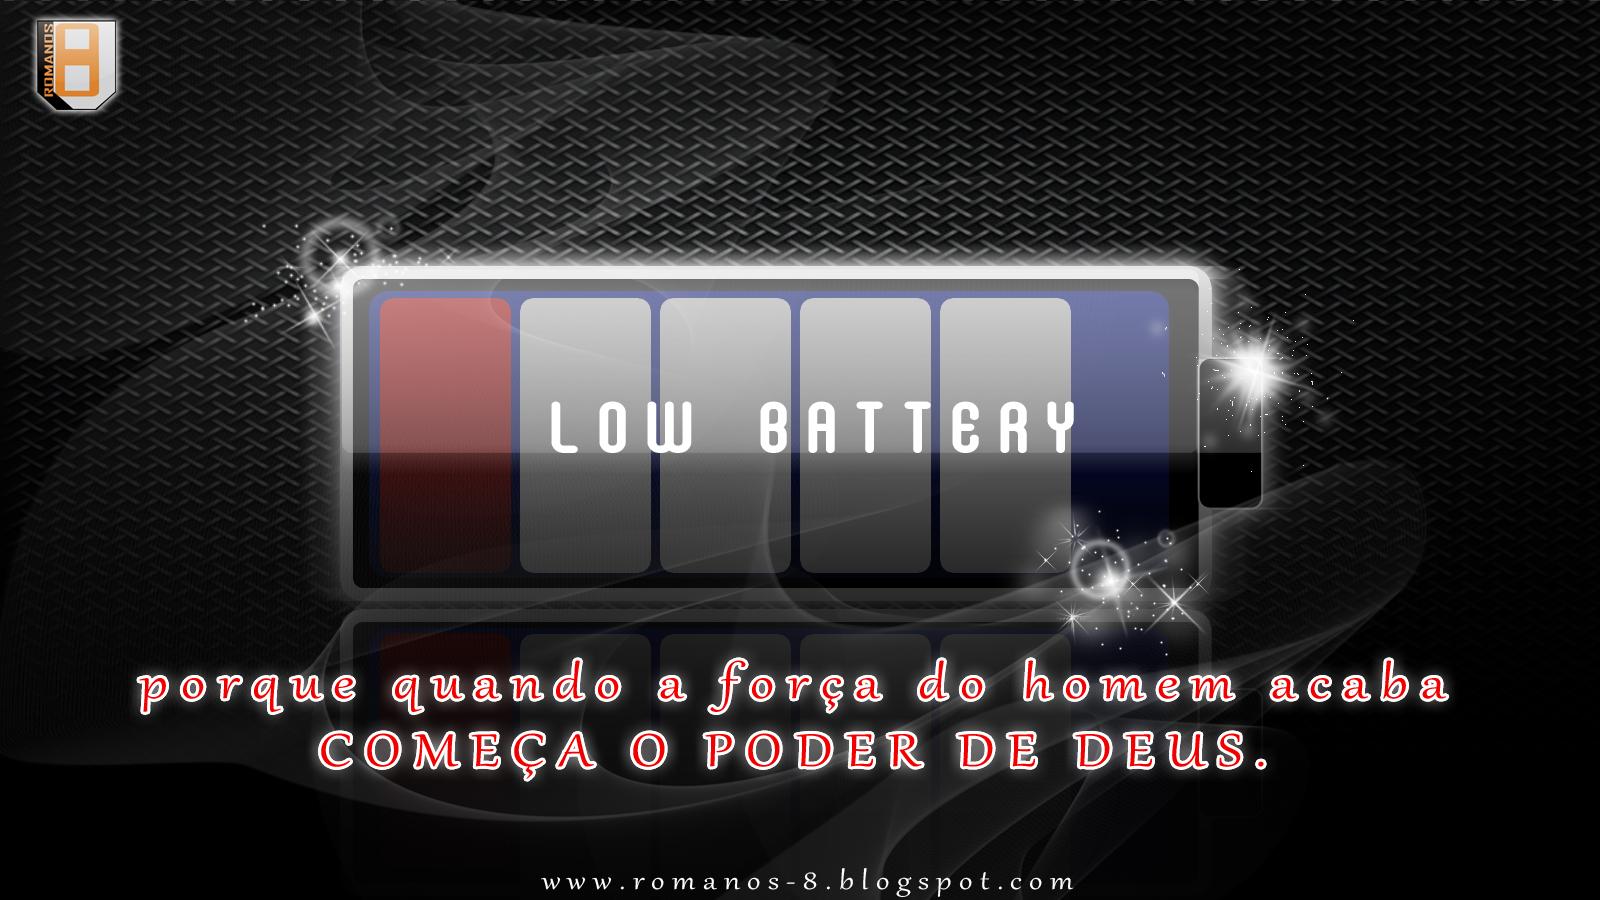 wallpaper: Will Live Wallpaper Drain Battery